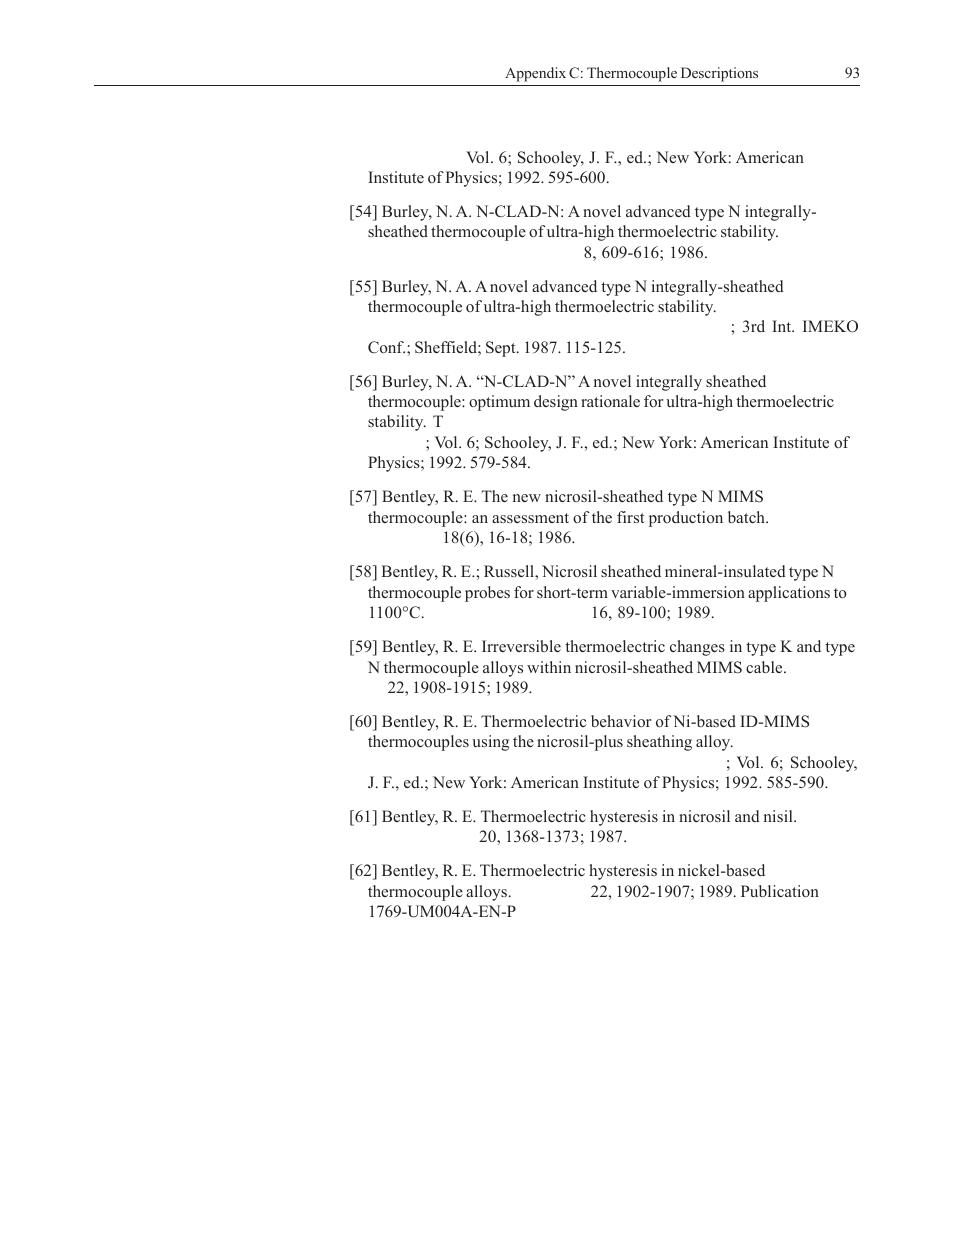 Spectrum Controls 1769sc-IF8u User Manual | Page 103 / 126